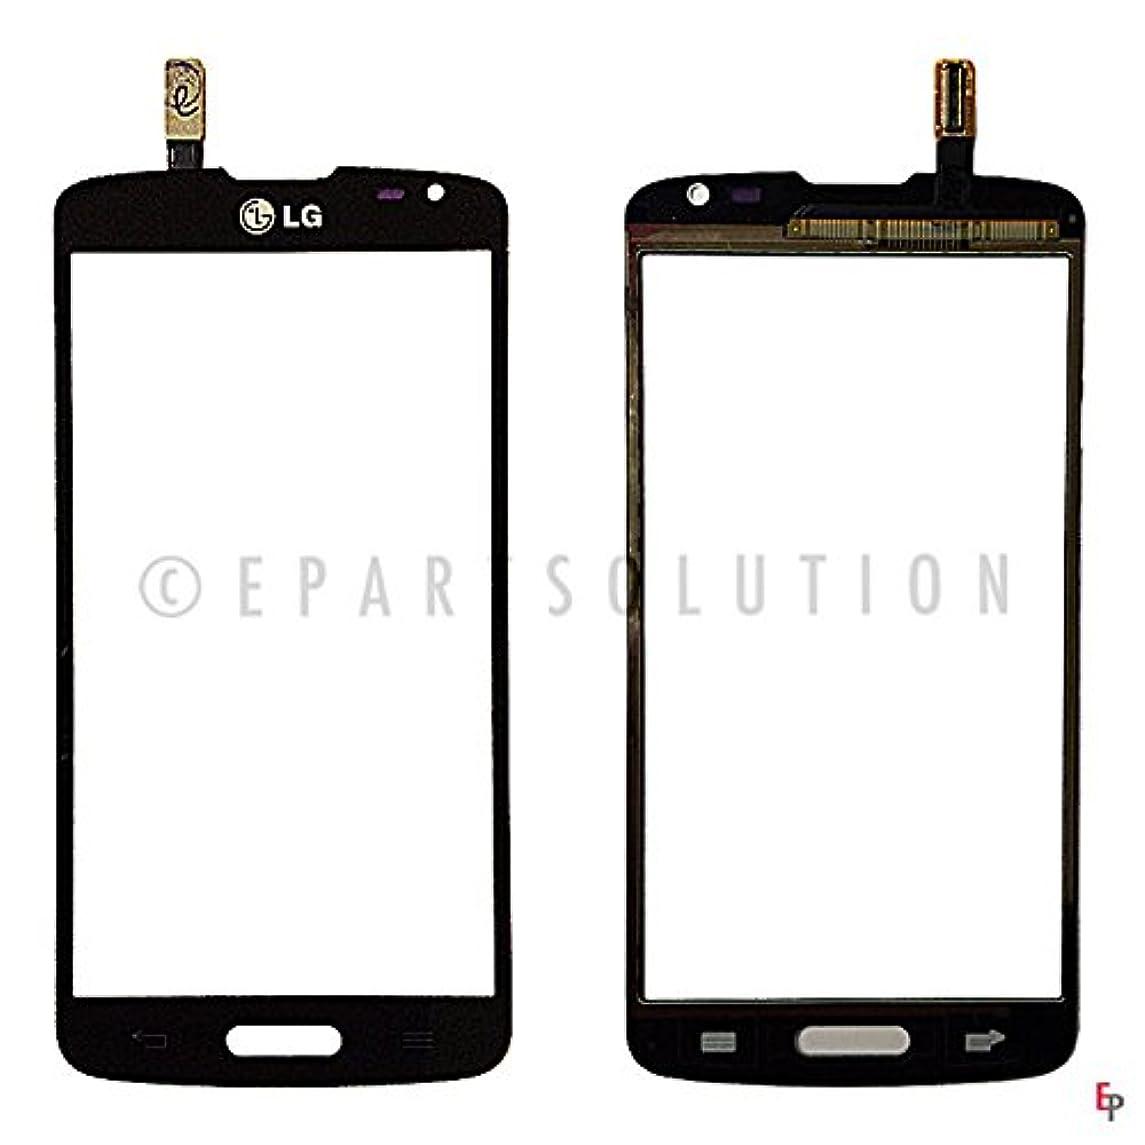 ePartSolution-LG Volt F90 LS740 Digitizer Touch Screen Lens Glass Black Color Replacement Part USA Seller